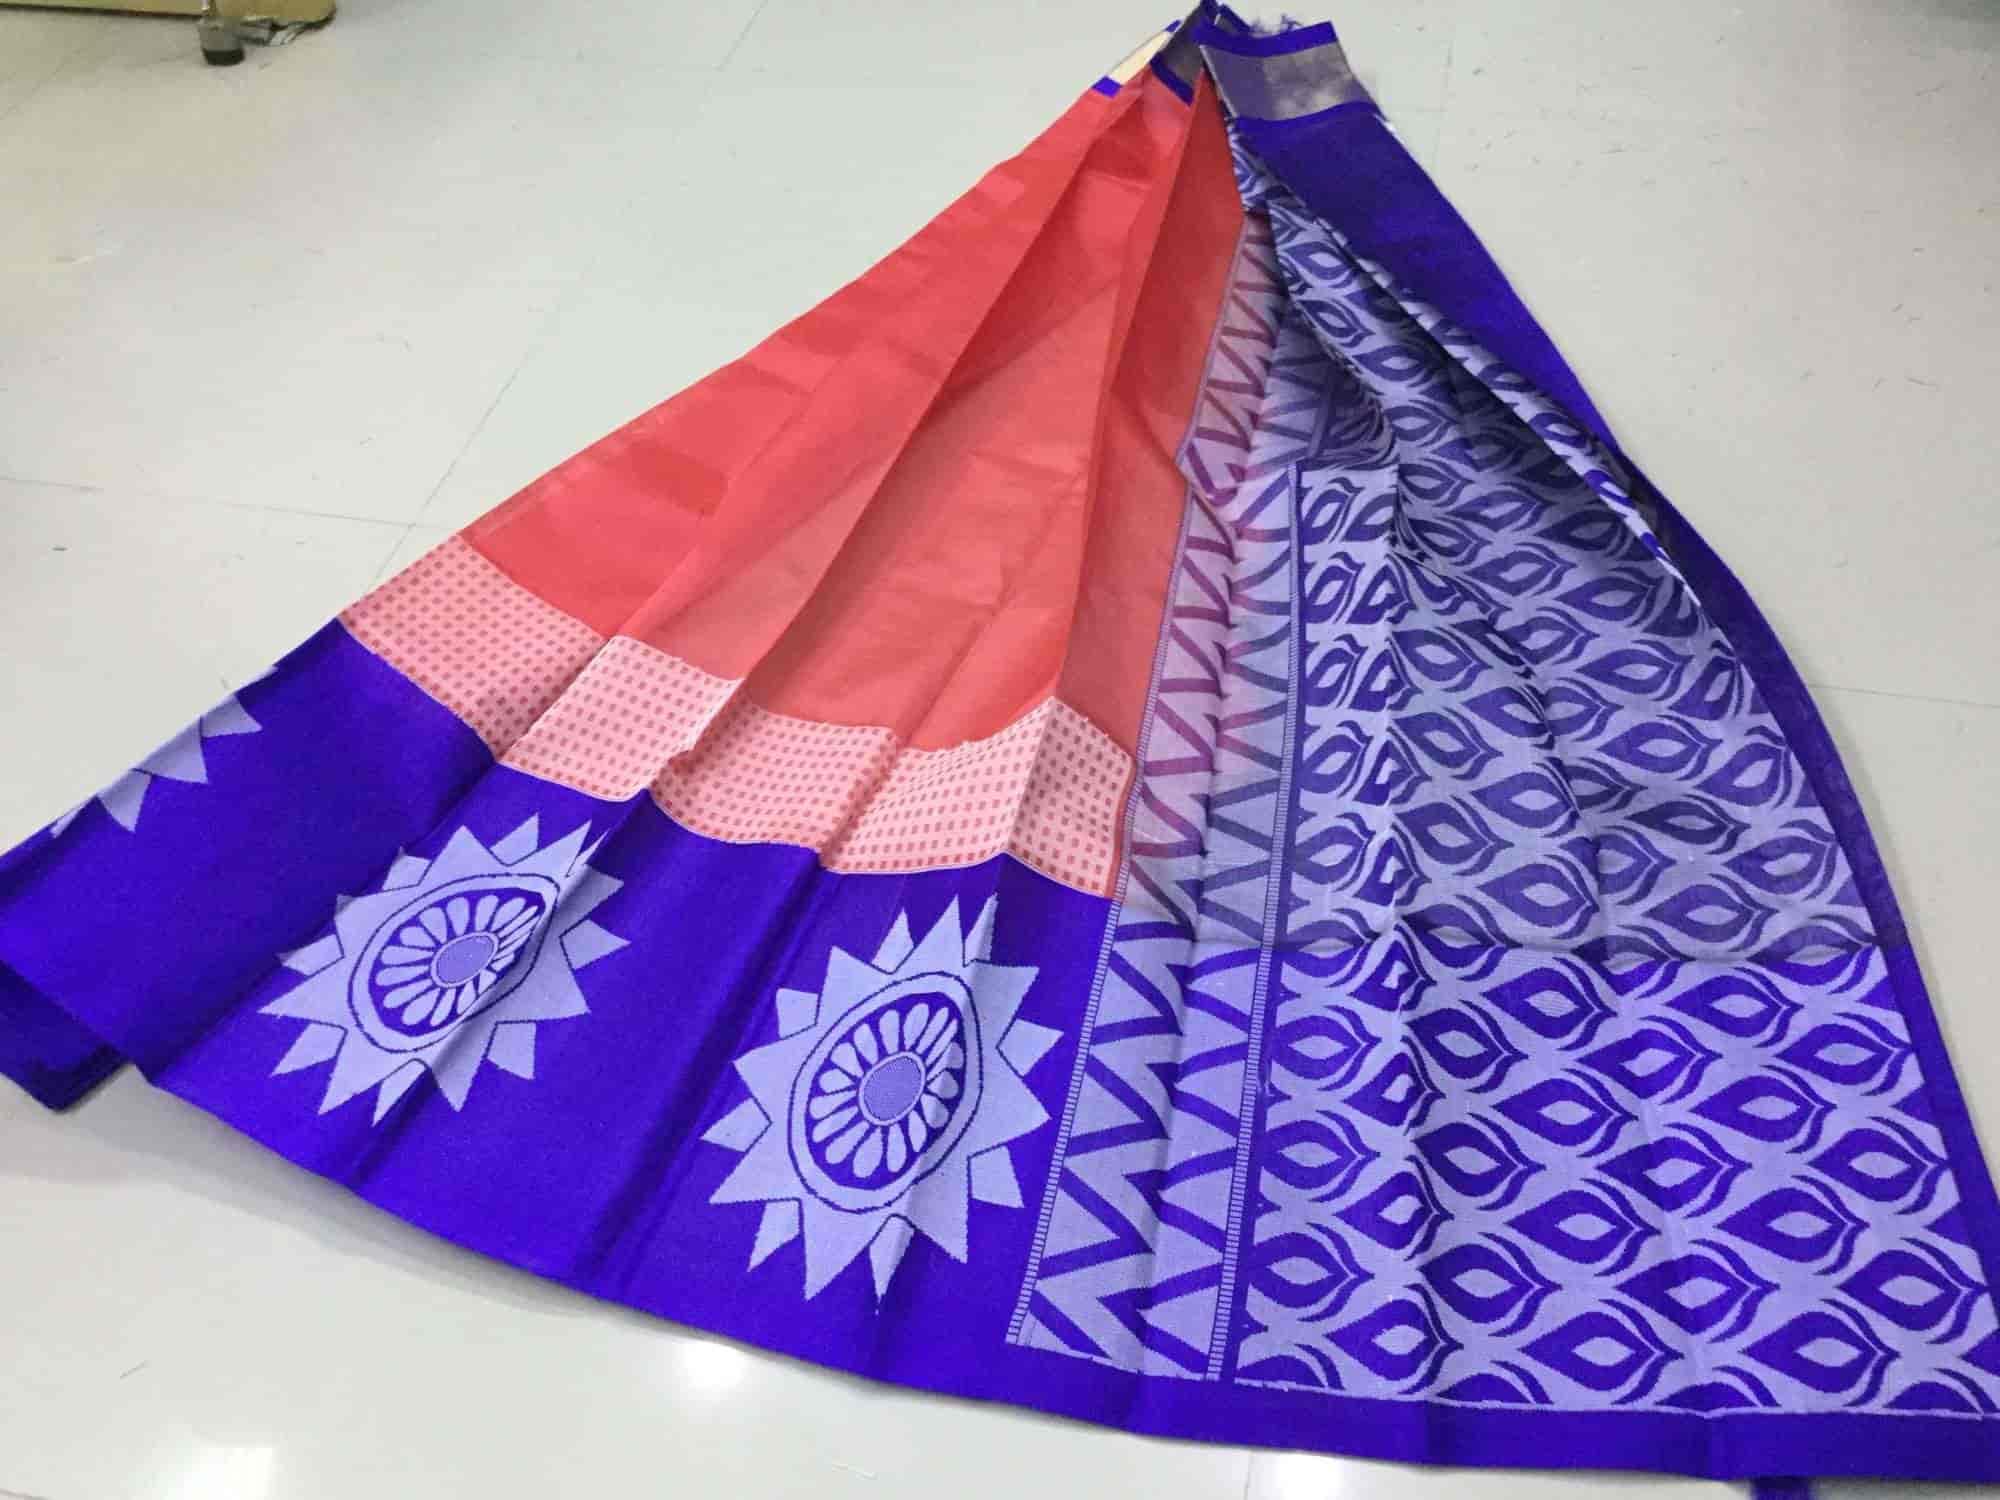 Bala Handlooms, Jandrapeta - Saree Wholesalers in Chirala - Justdial